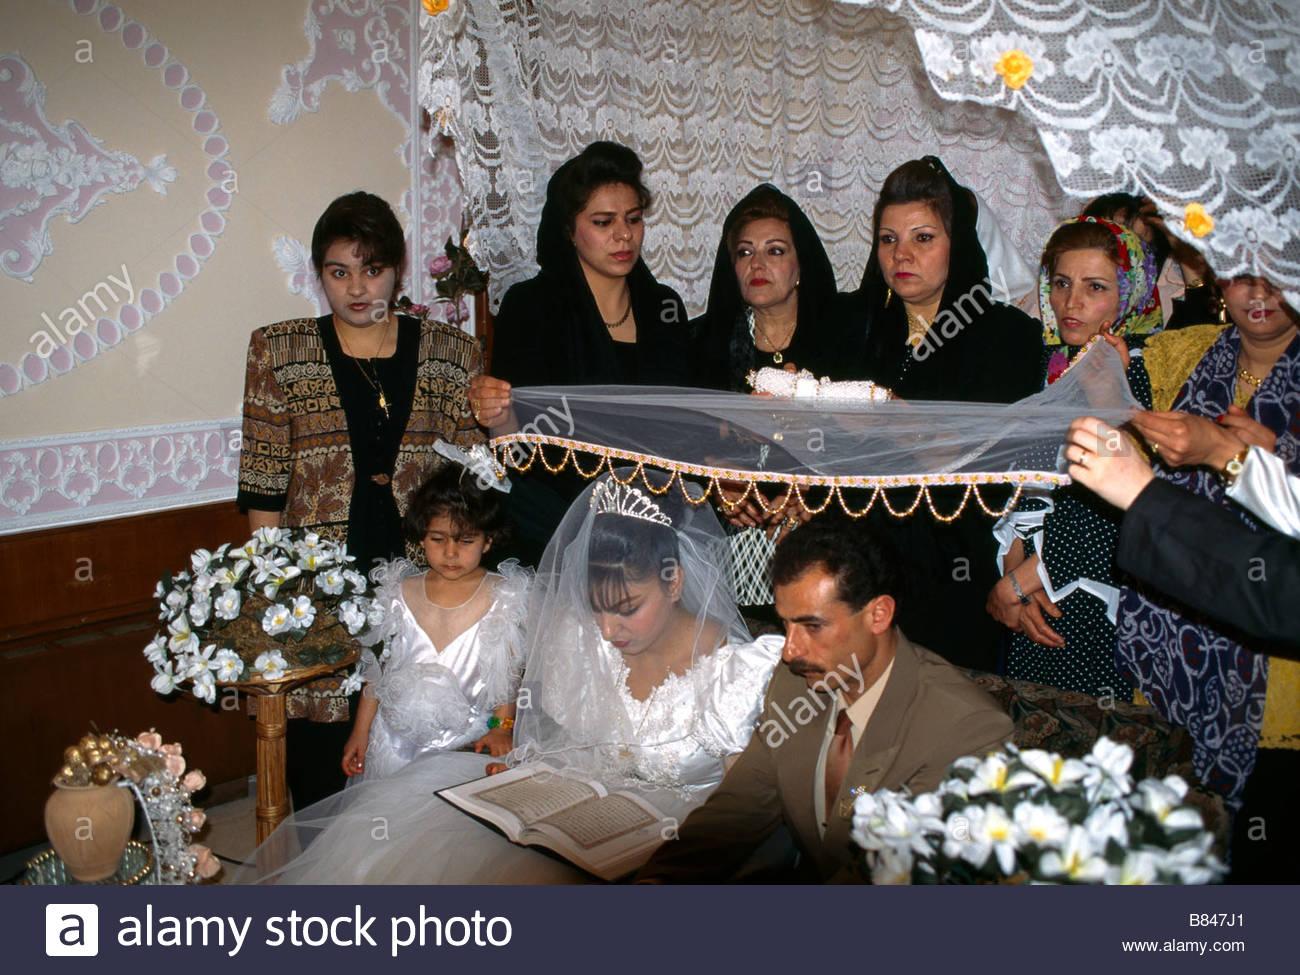 Shiraz Iran Islamic Wedding Ceremony Bride And Groom Exchange Vows Over Koran - Stock Image